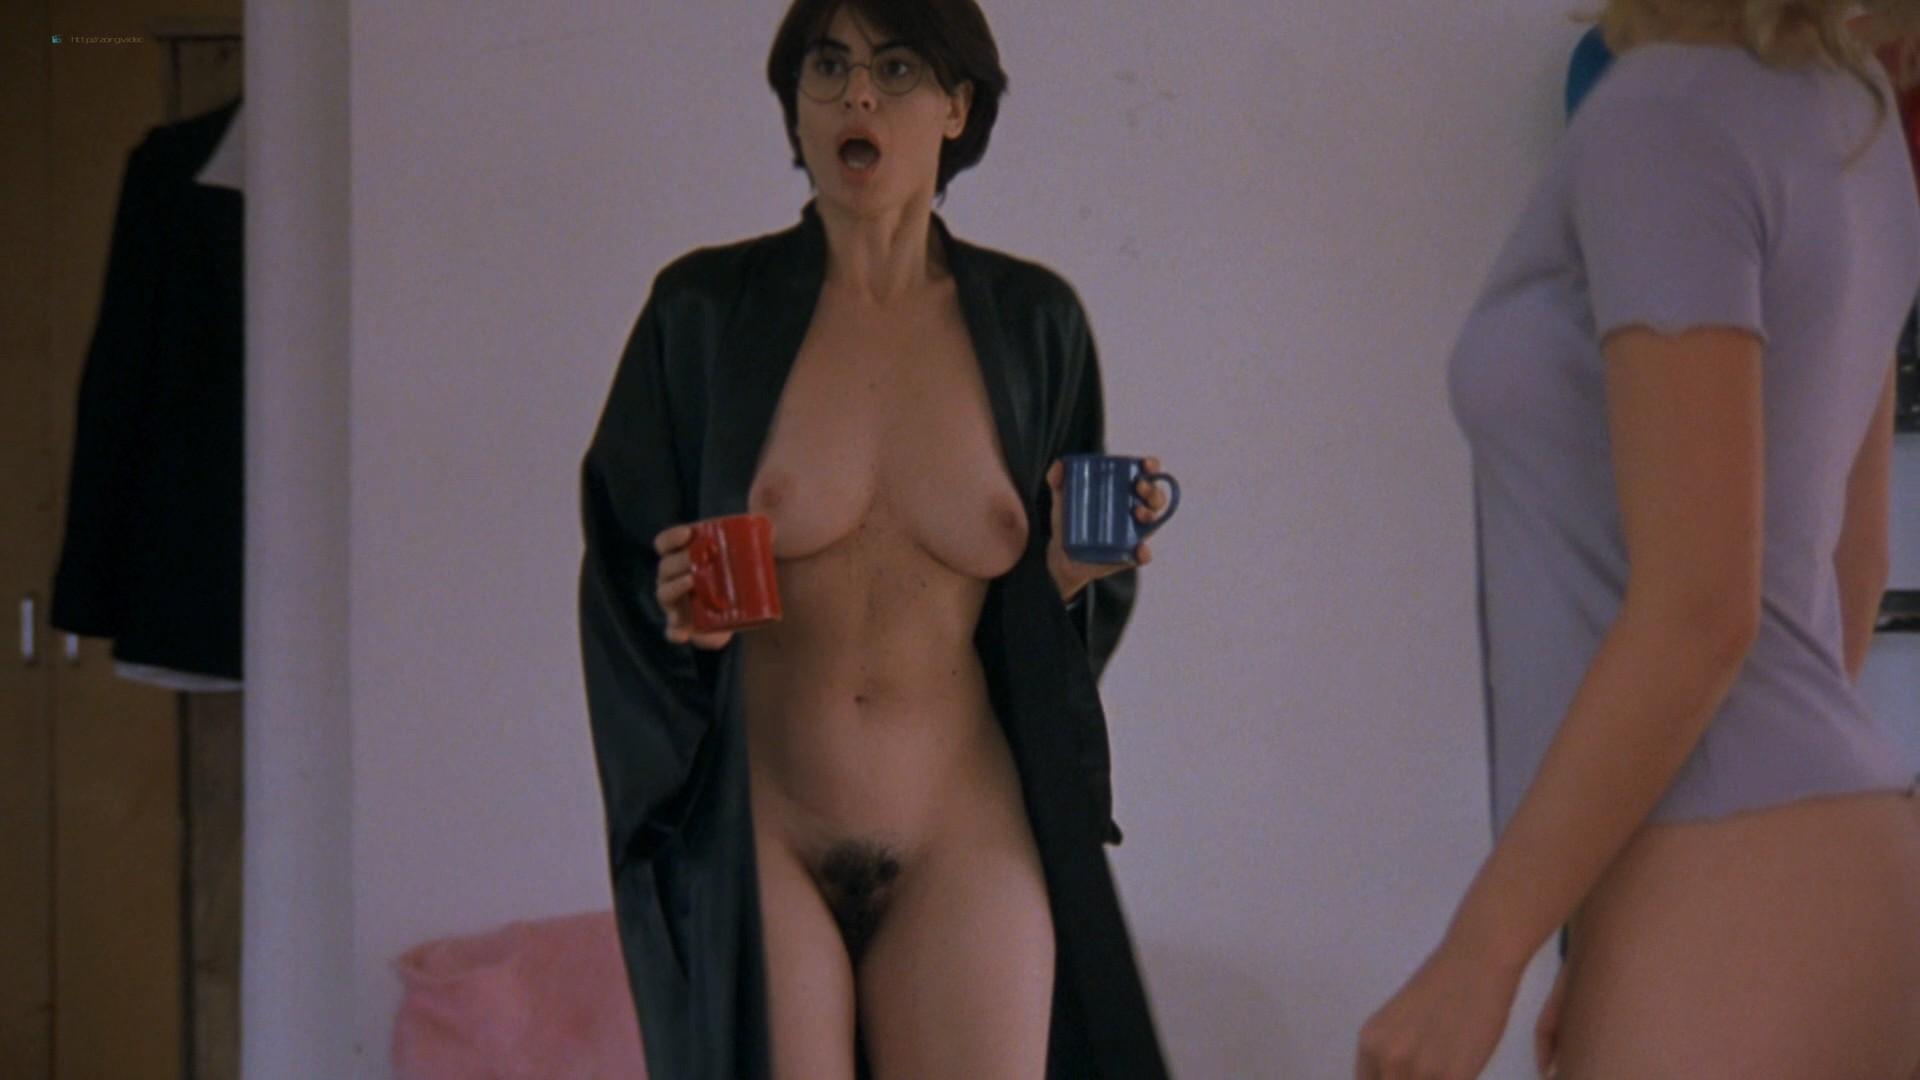 Yuliya Mayarchuk nude sex explicit Francesca Nunzi, Leila Carli all nude - Trasgredire (2000) HD 1080p BluRay (9)